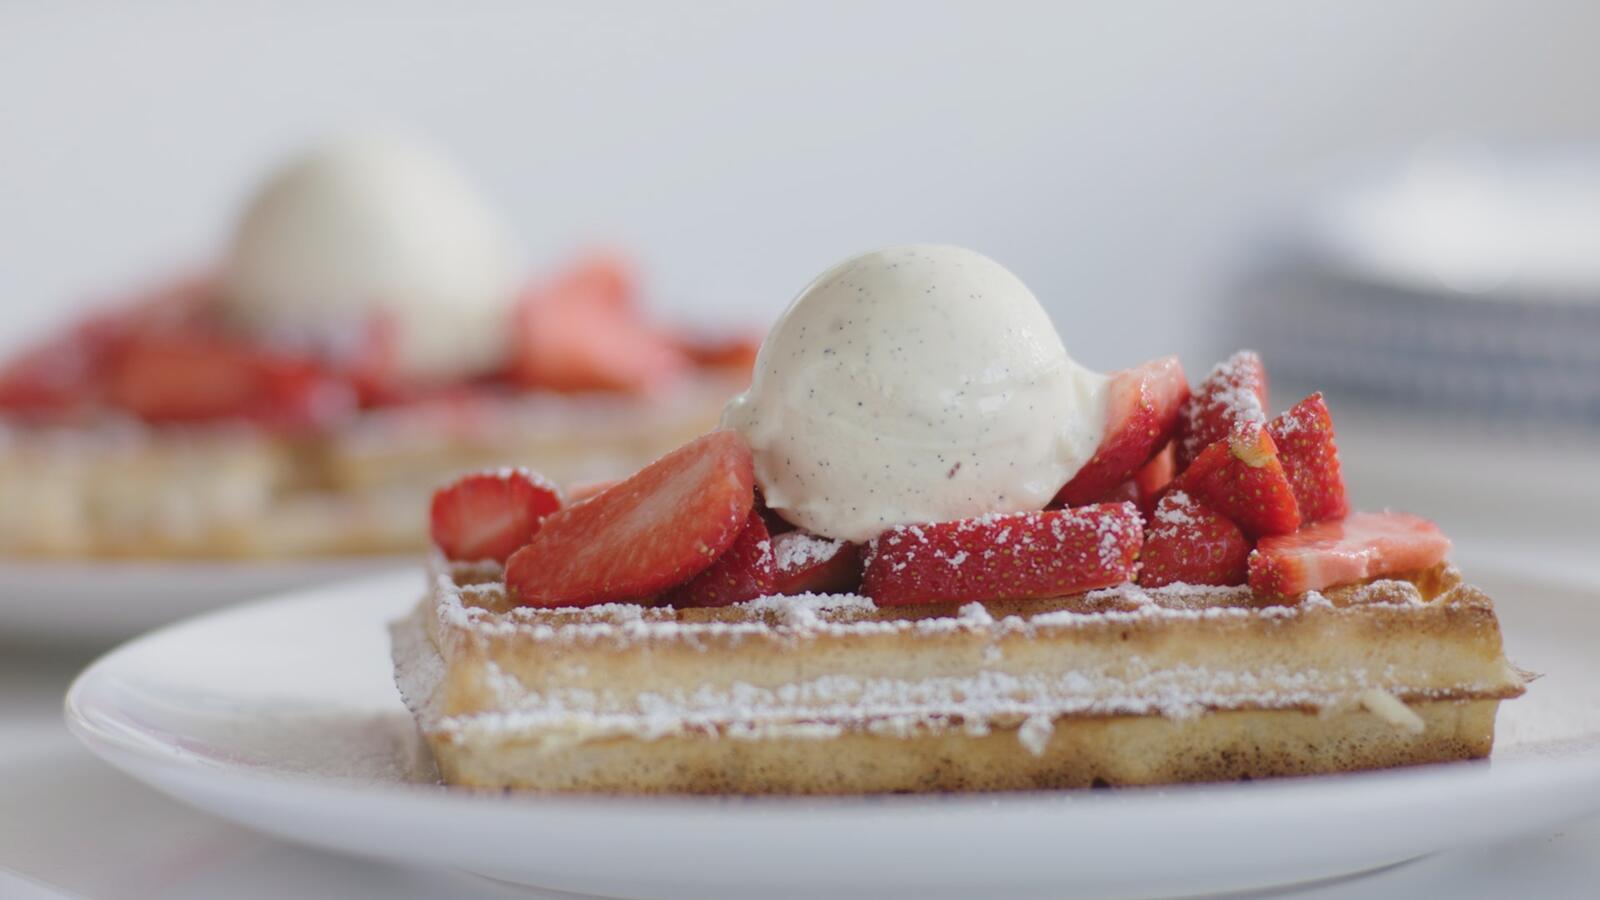 Brusselse wafel met vanille-ijs en aardbeien